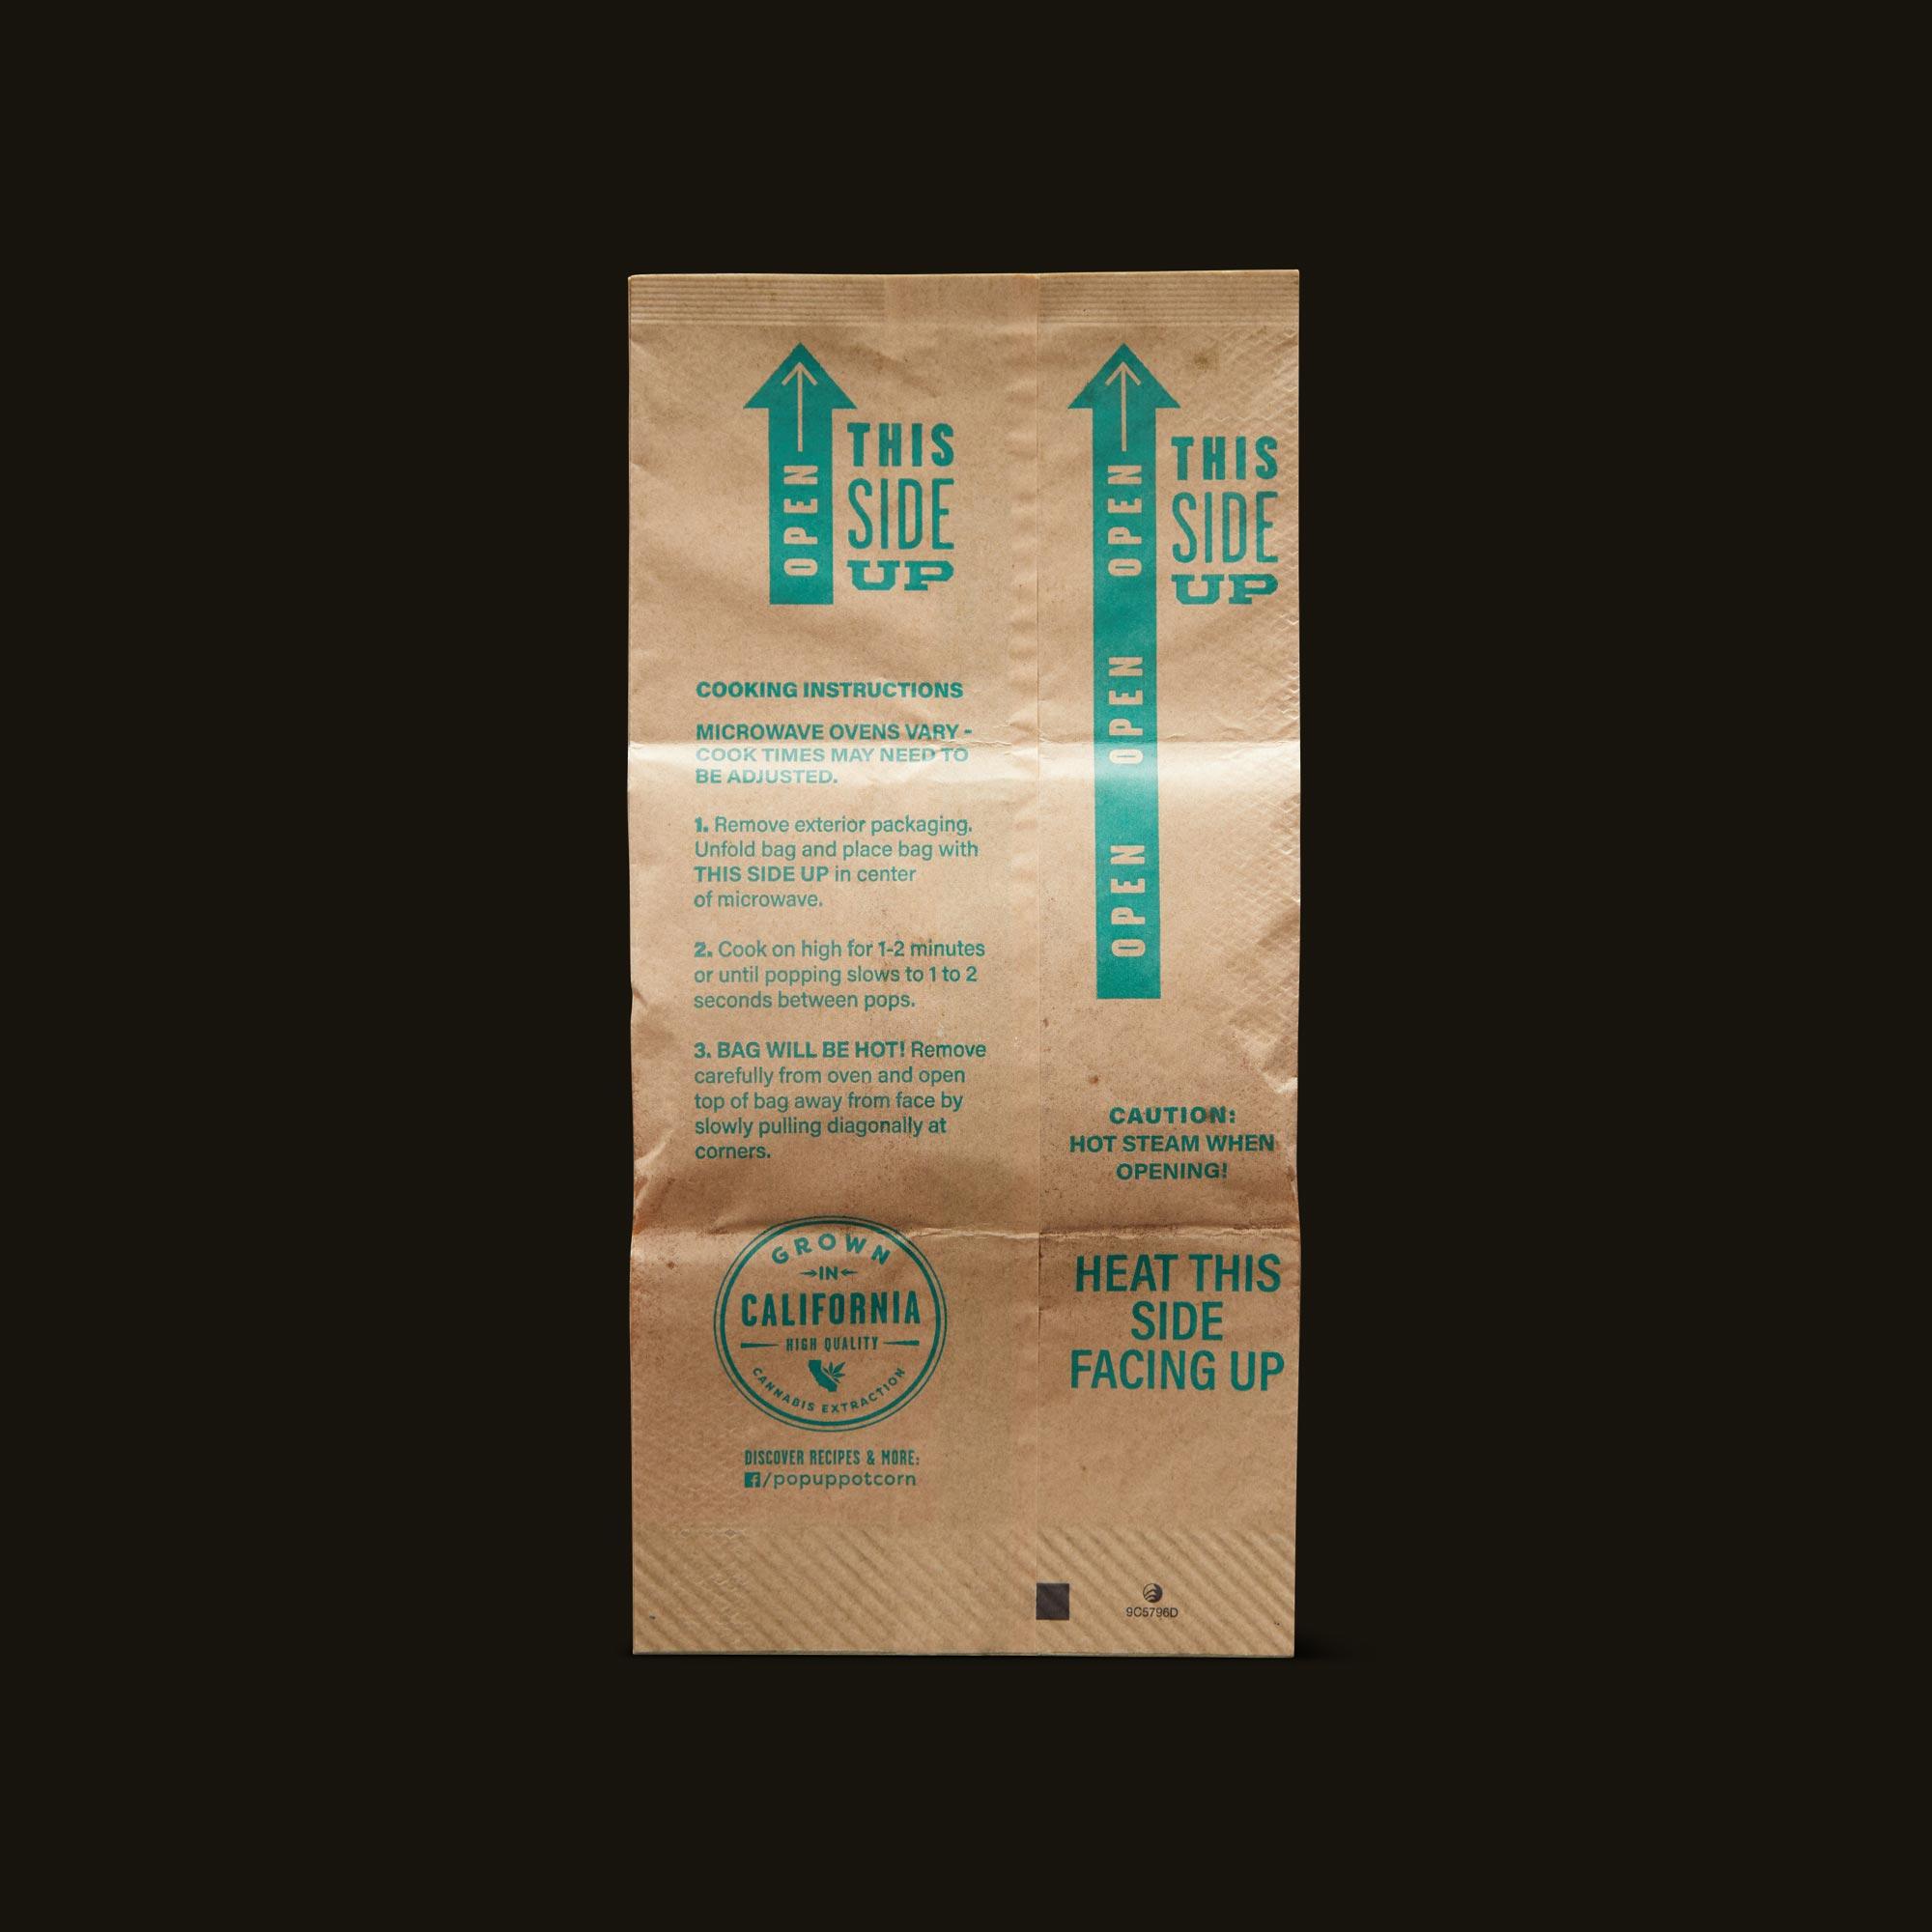 Pop-Up Potcorn Sea Salt Popcorn 10:1 3-Pack Instructions